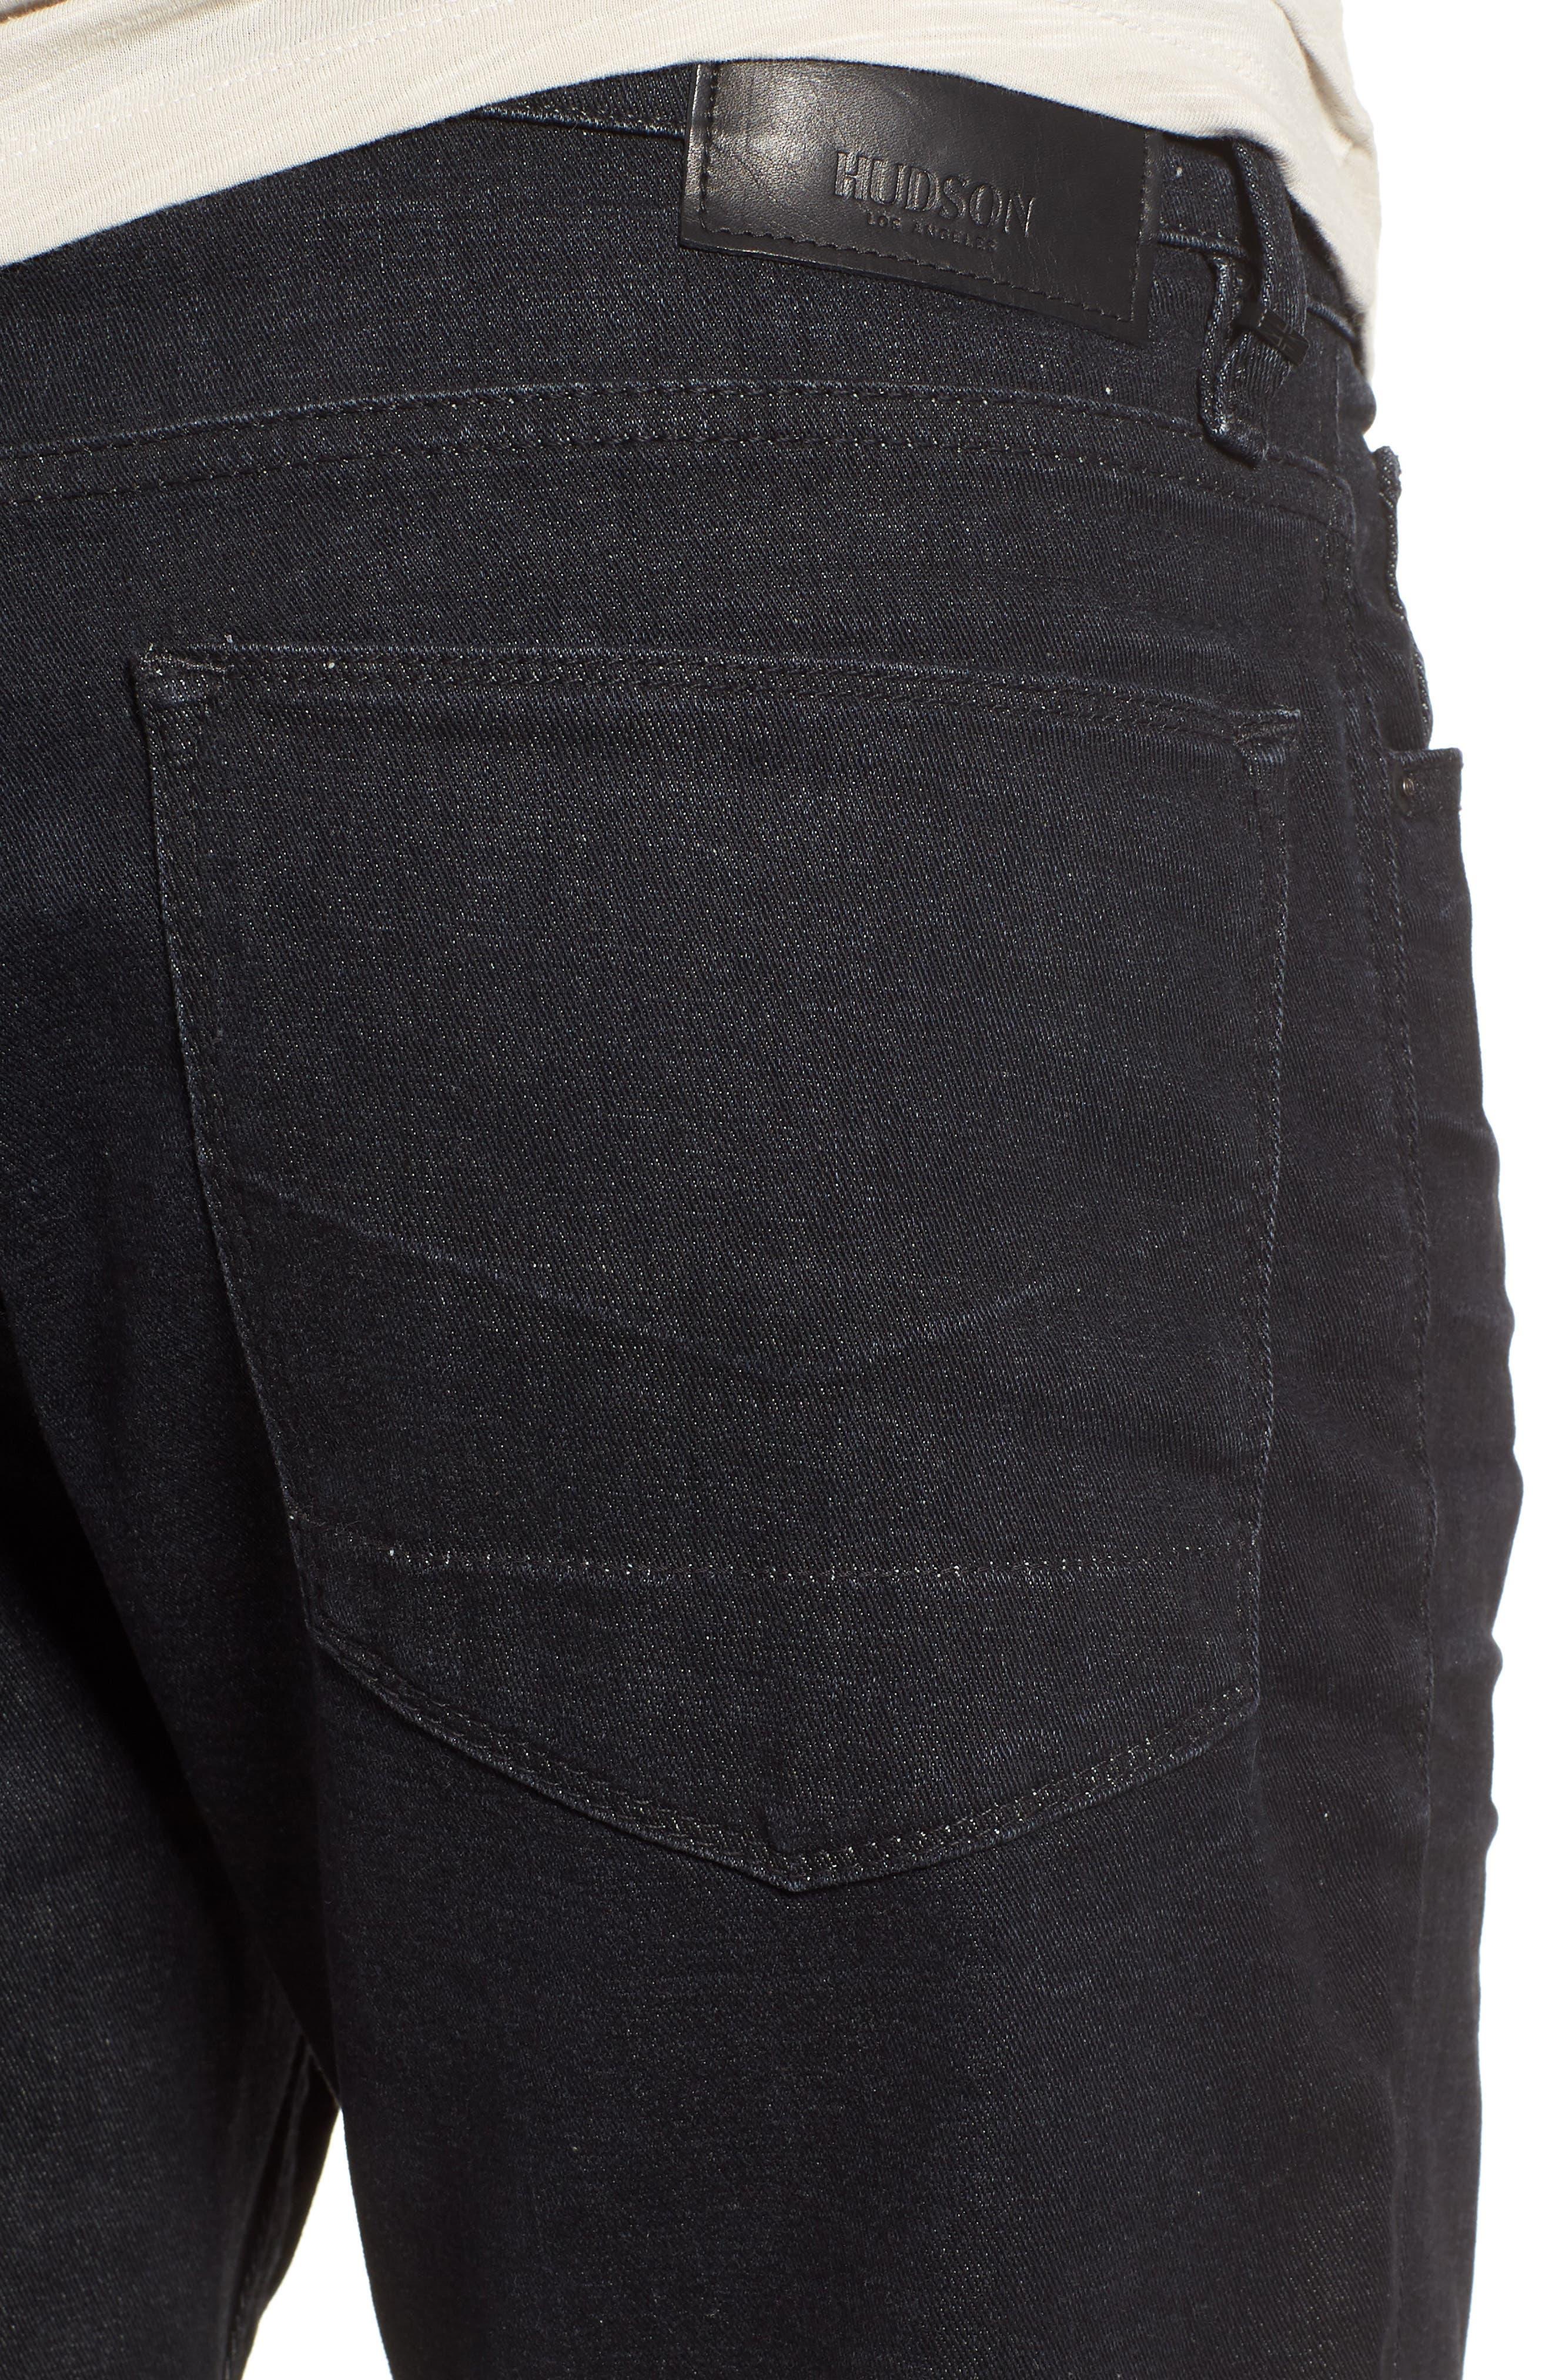 Zack Skinny Fit Jeans,                             Alternate thumbnail 4, color,                             001